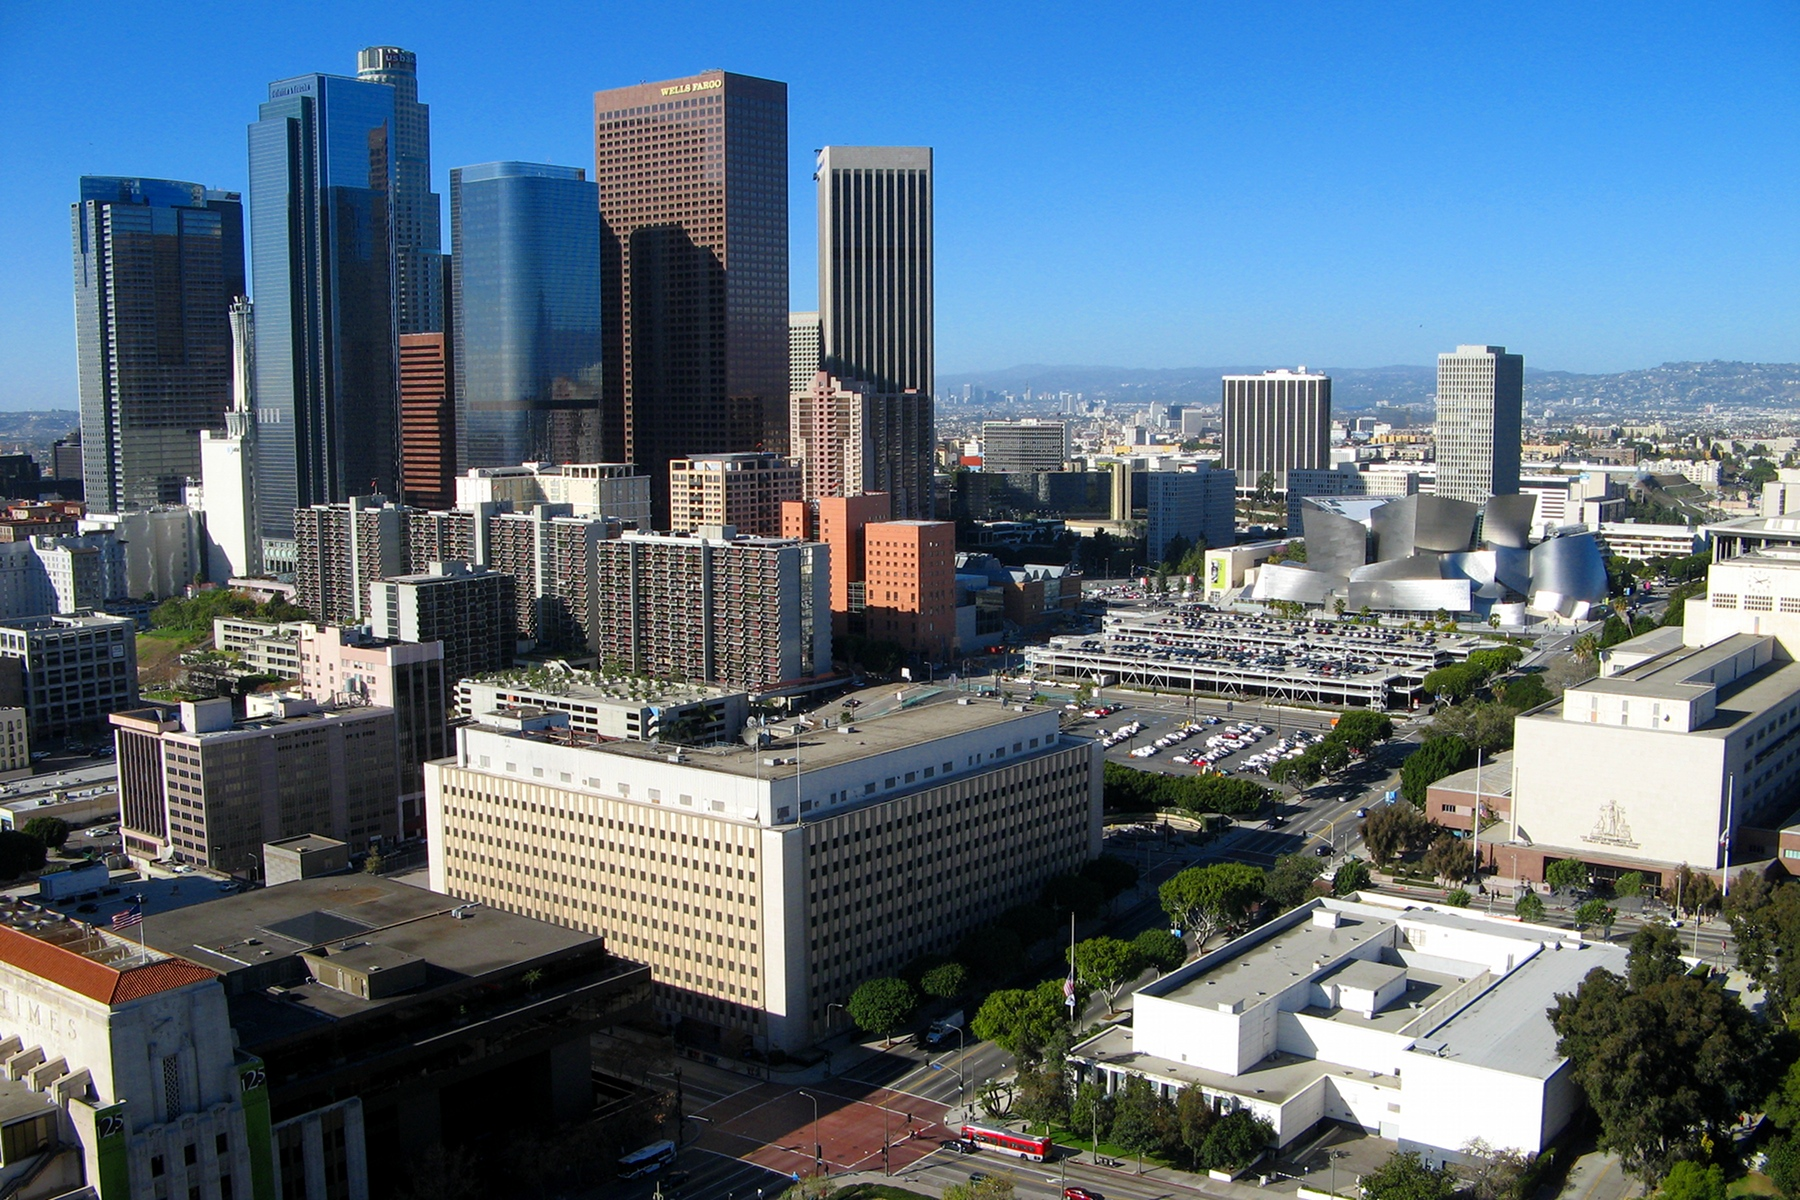 San Pedro Los Angeles California Cruise Port